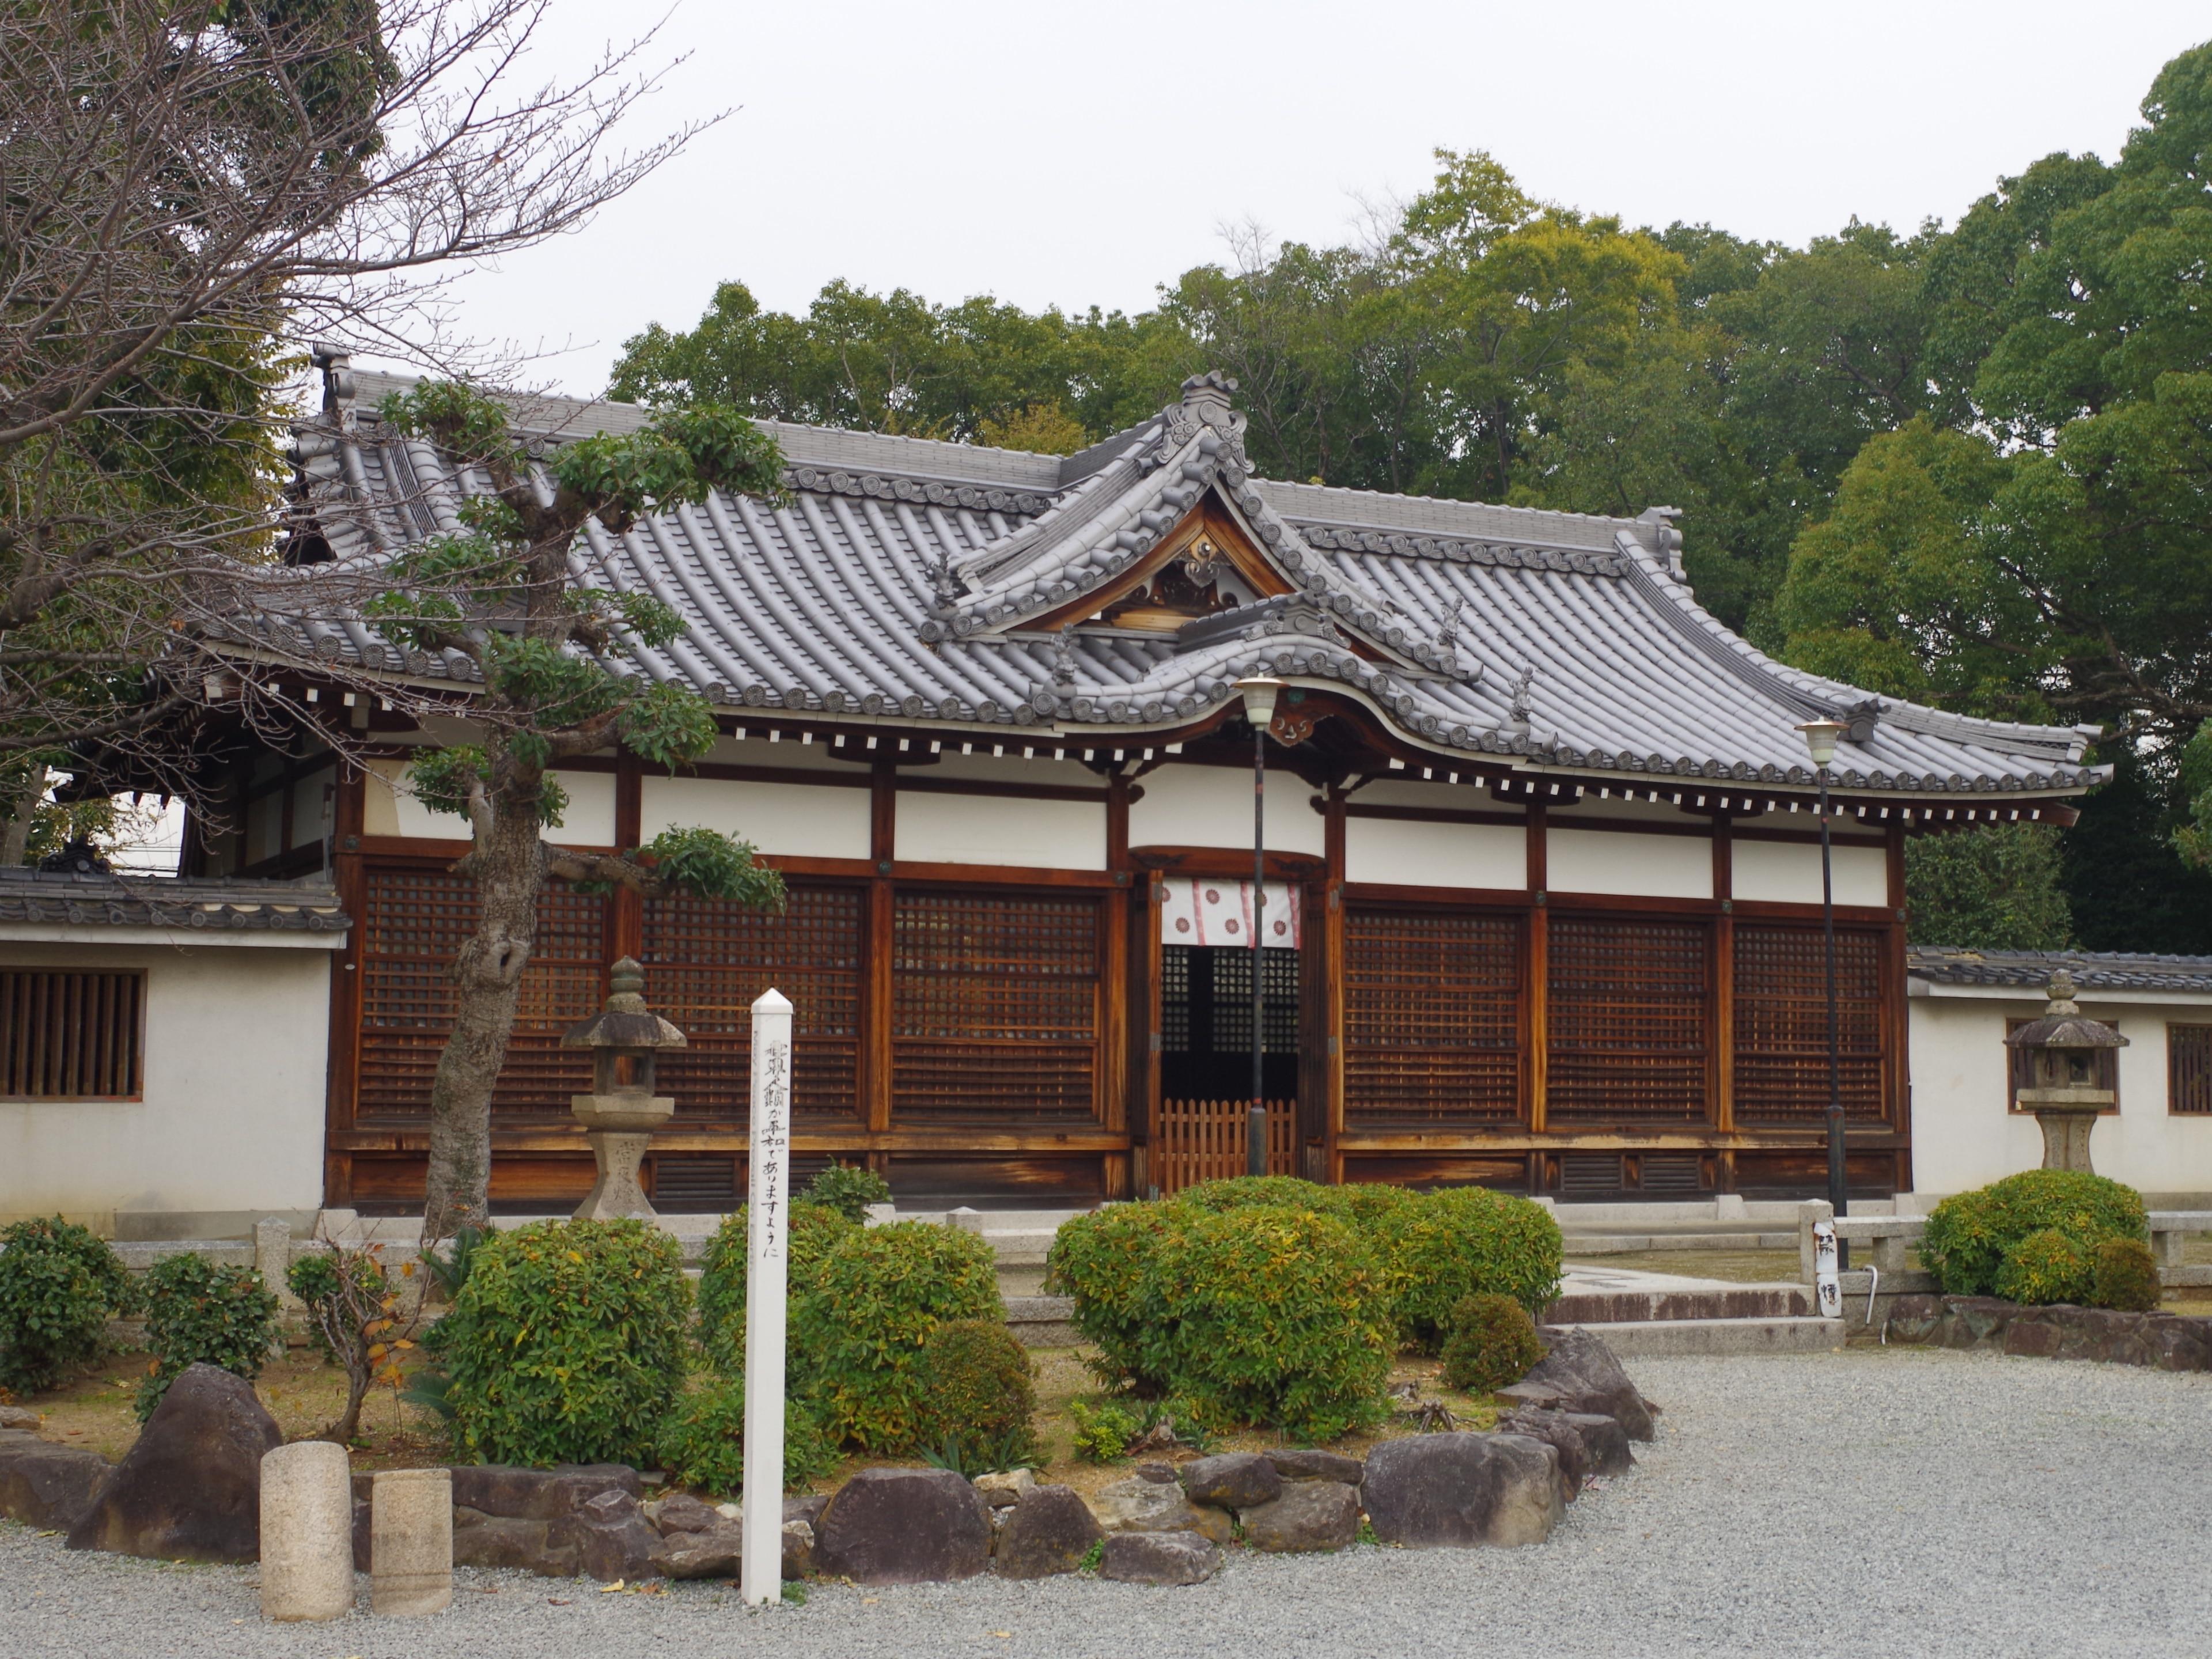 Izumi, Präfektur Osaka, Japan